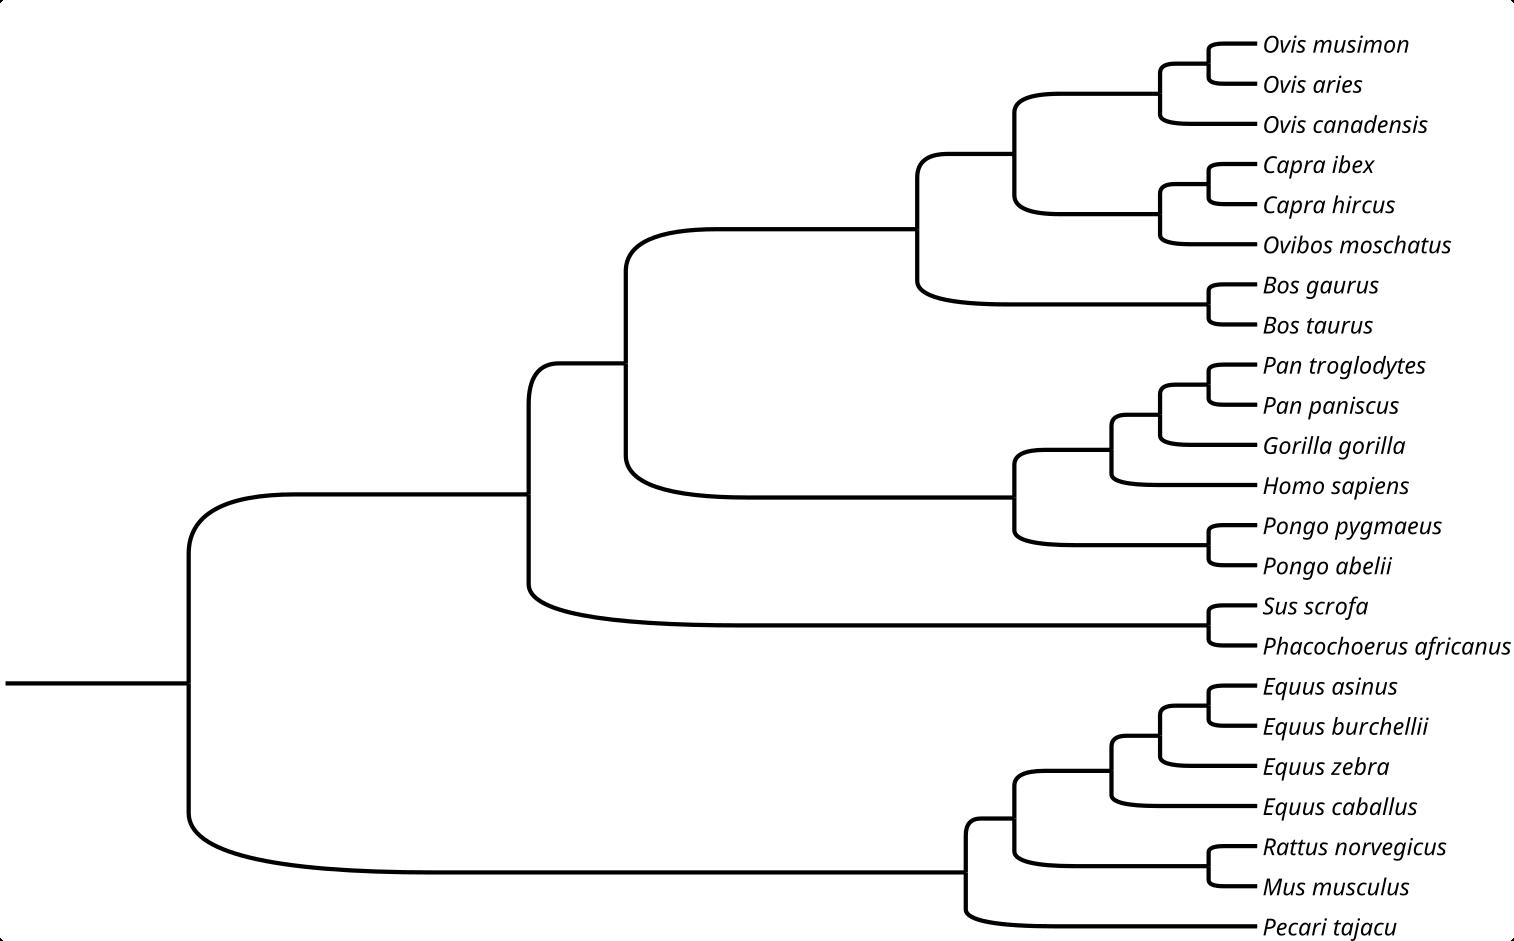 Tree of Mammalian COI